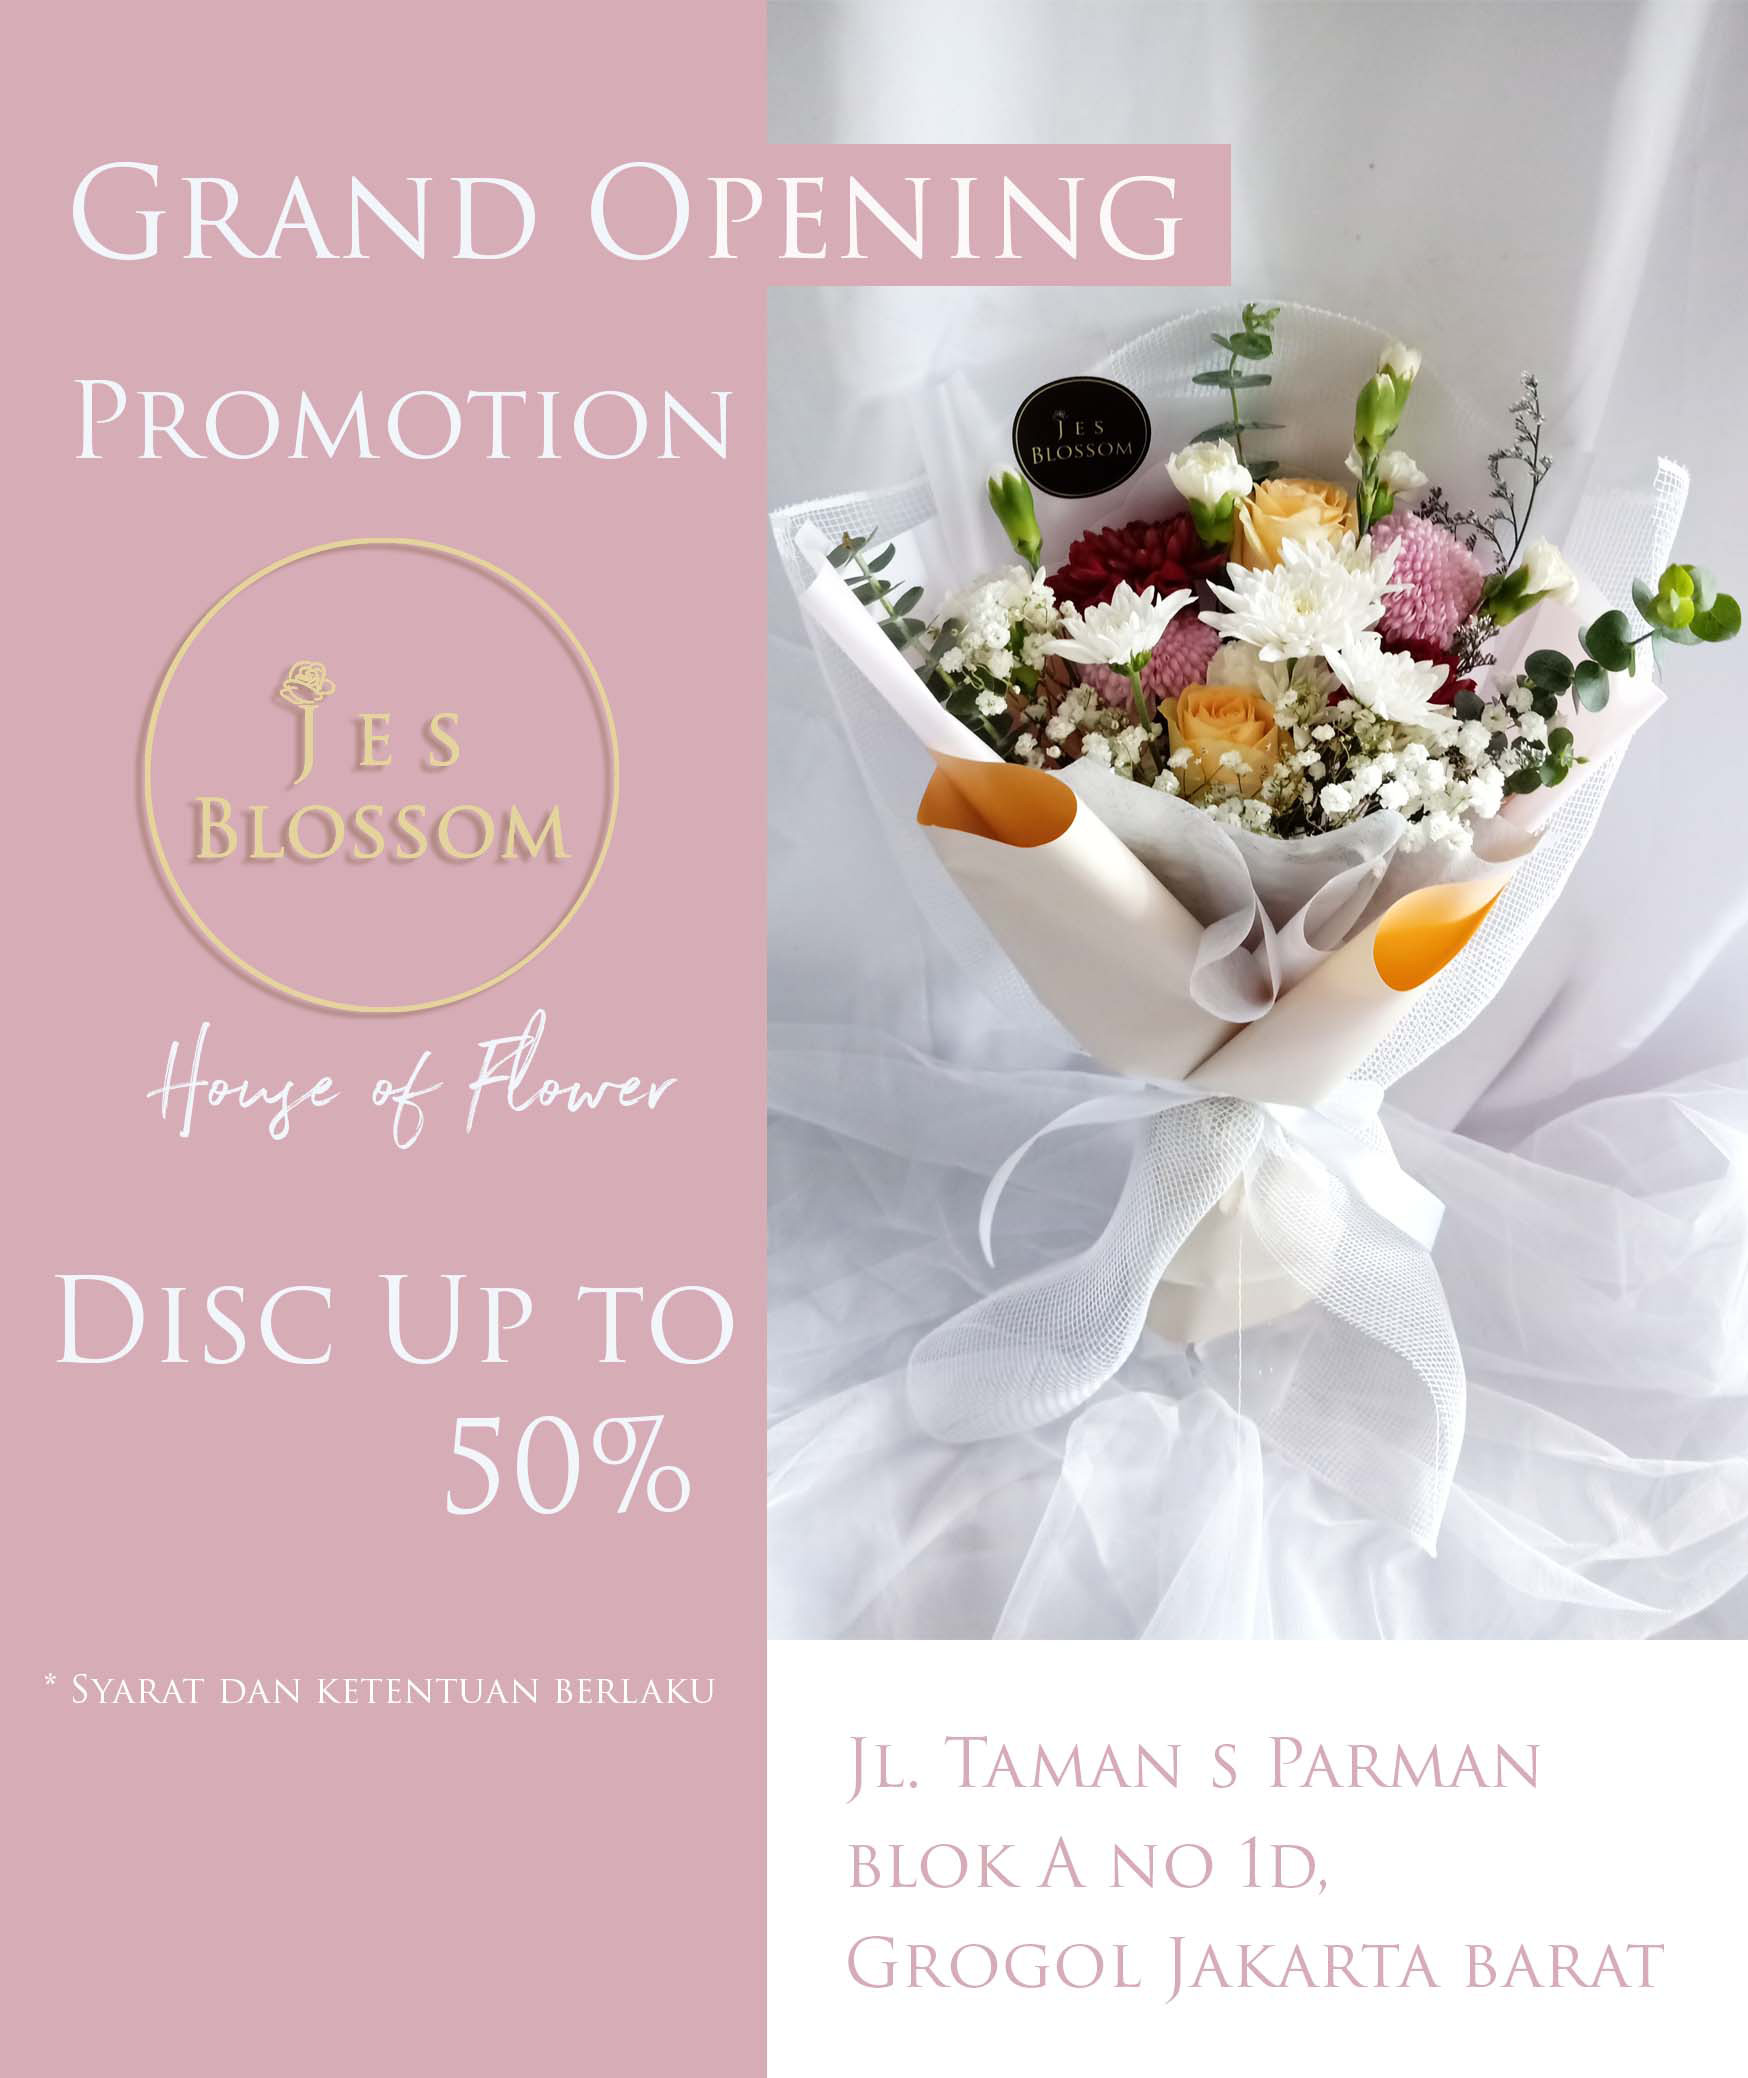 Jes Blossom Korean Bouquet Promo Discount Up To 50%